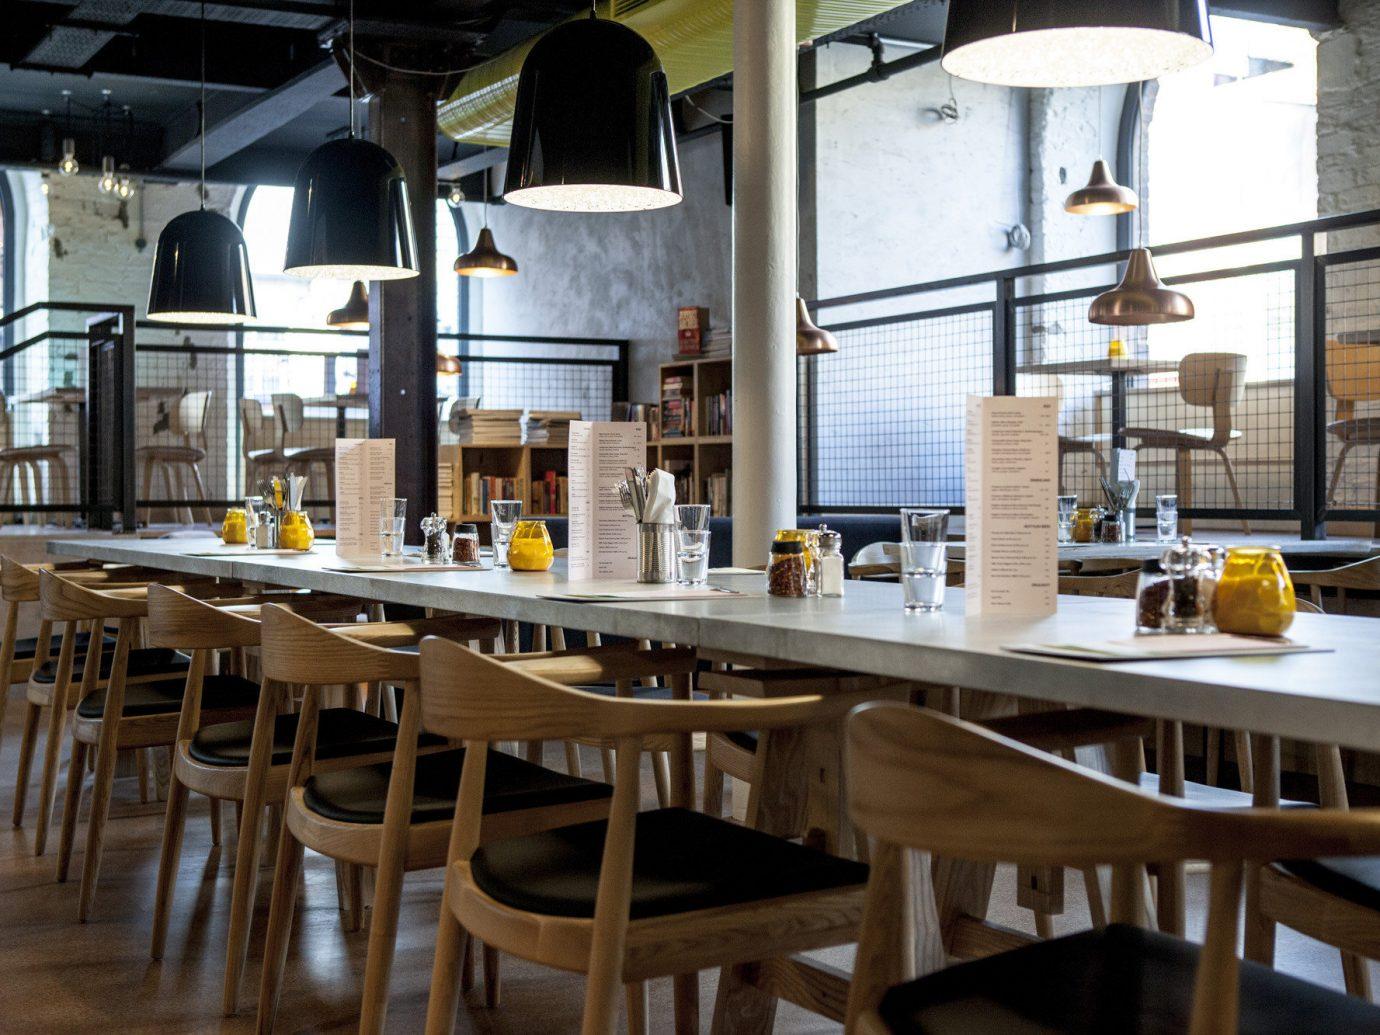 Trip Ideas table floor chair indoor Dining interior design restaurant furniture area Bar dining table dining room